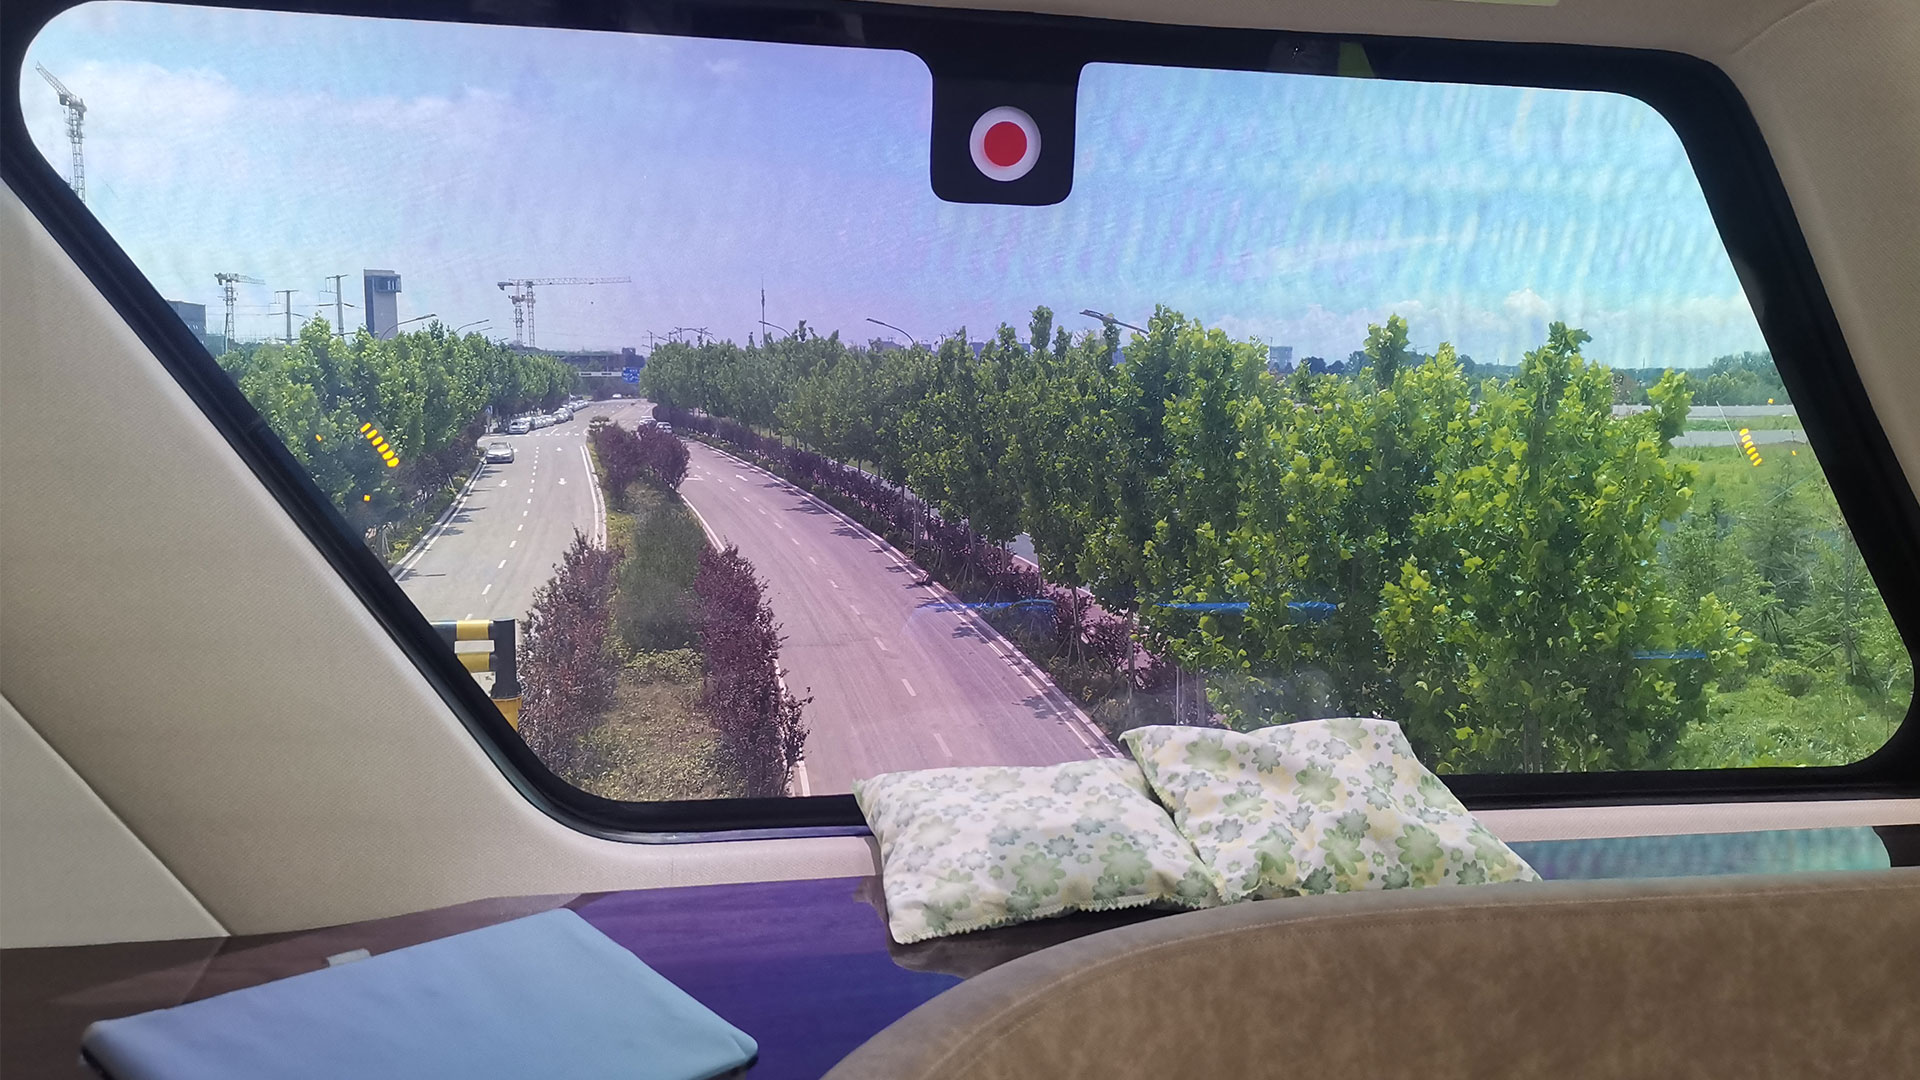 China debuts the world's fastest 600 km/h maglev train featuring LUMINEQ's futurist transparent displays